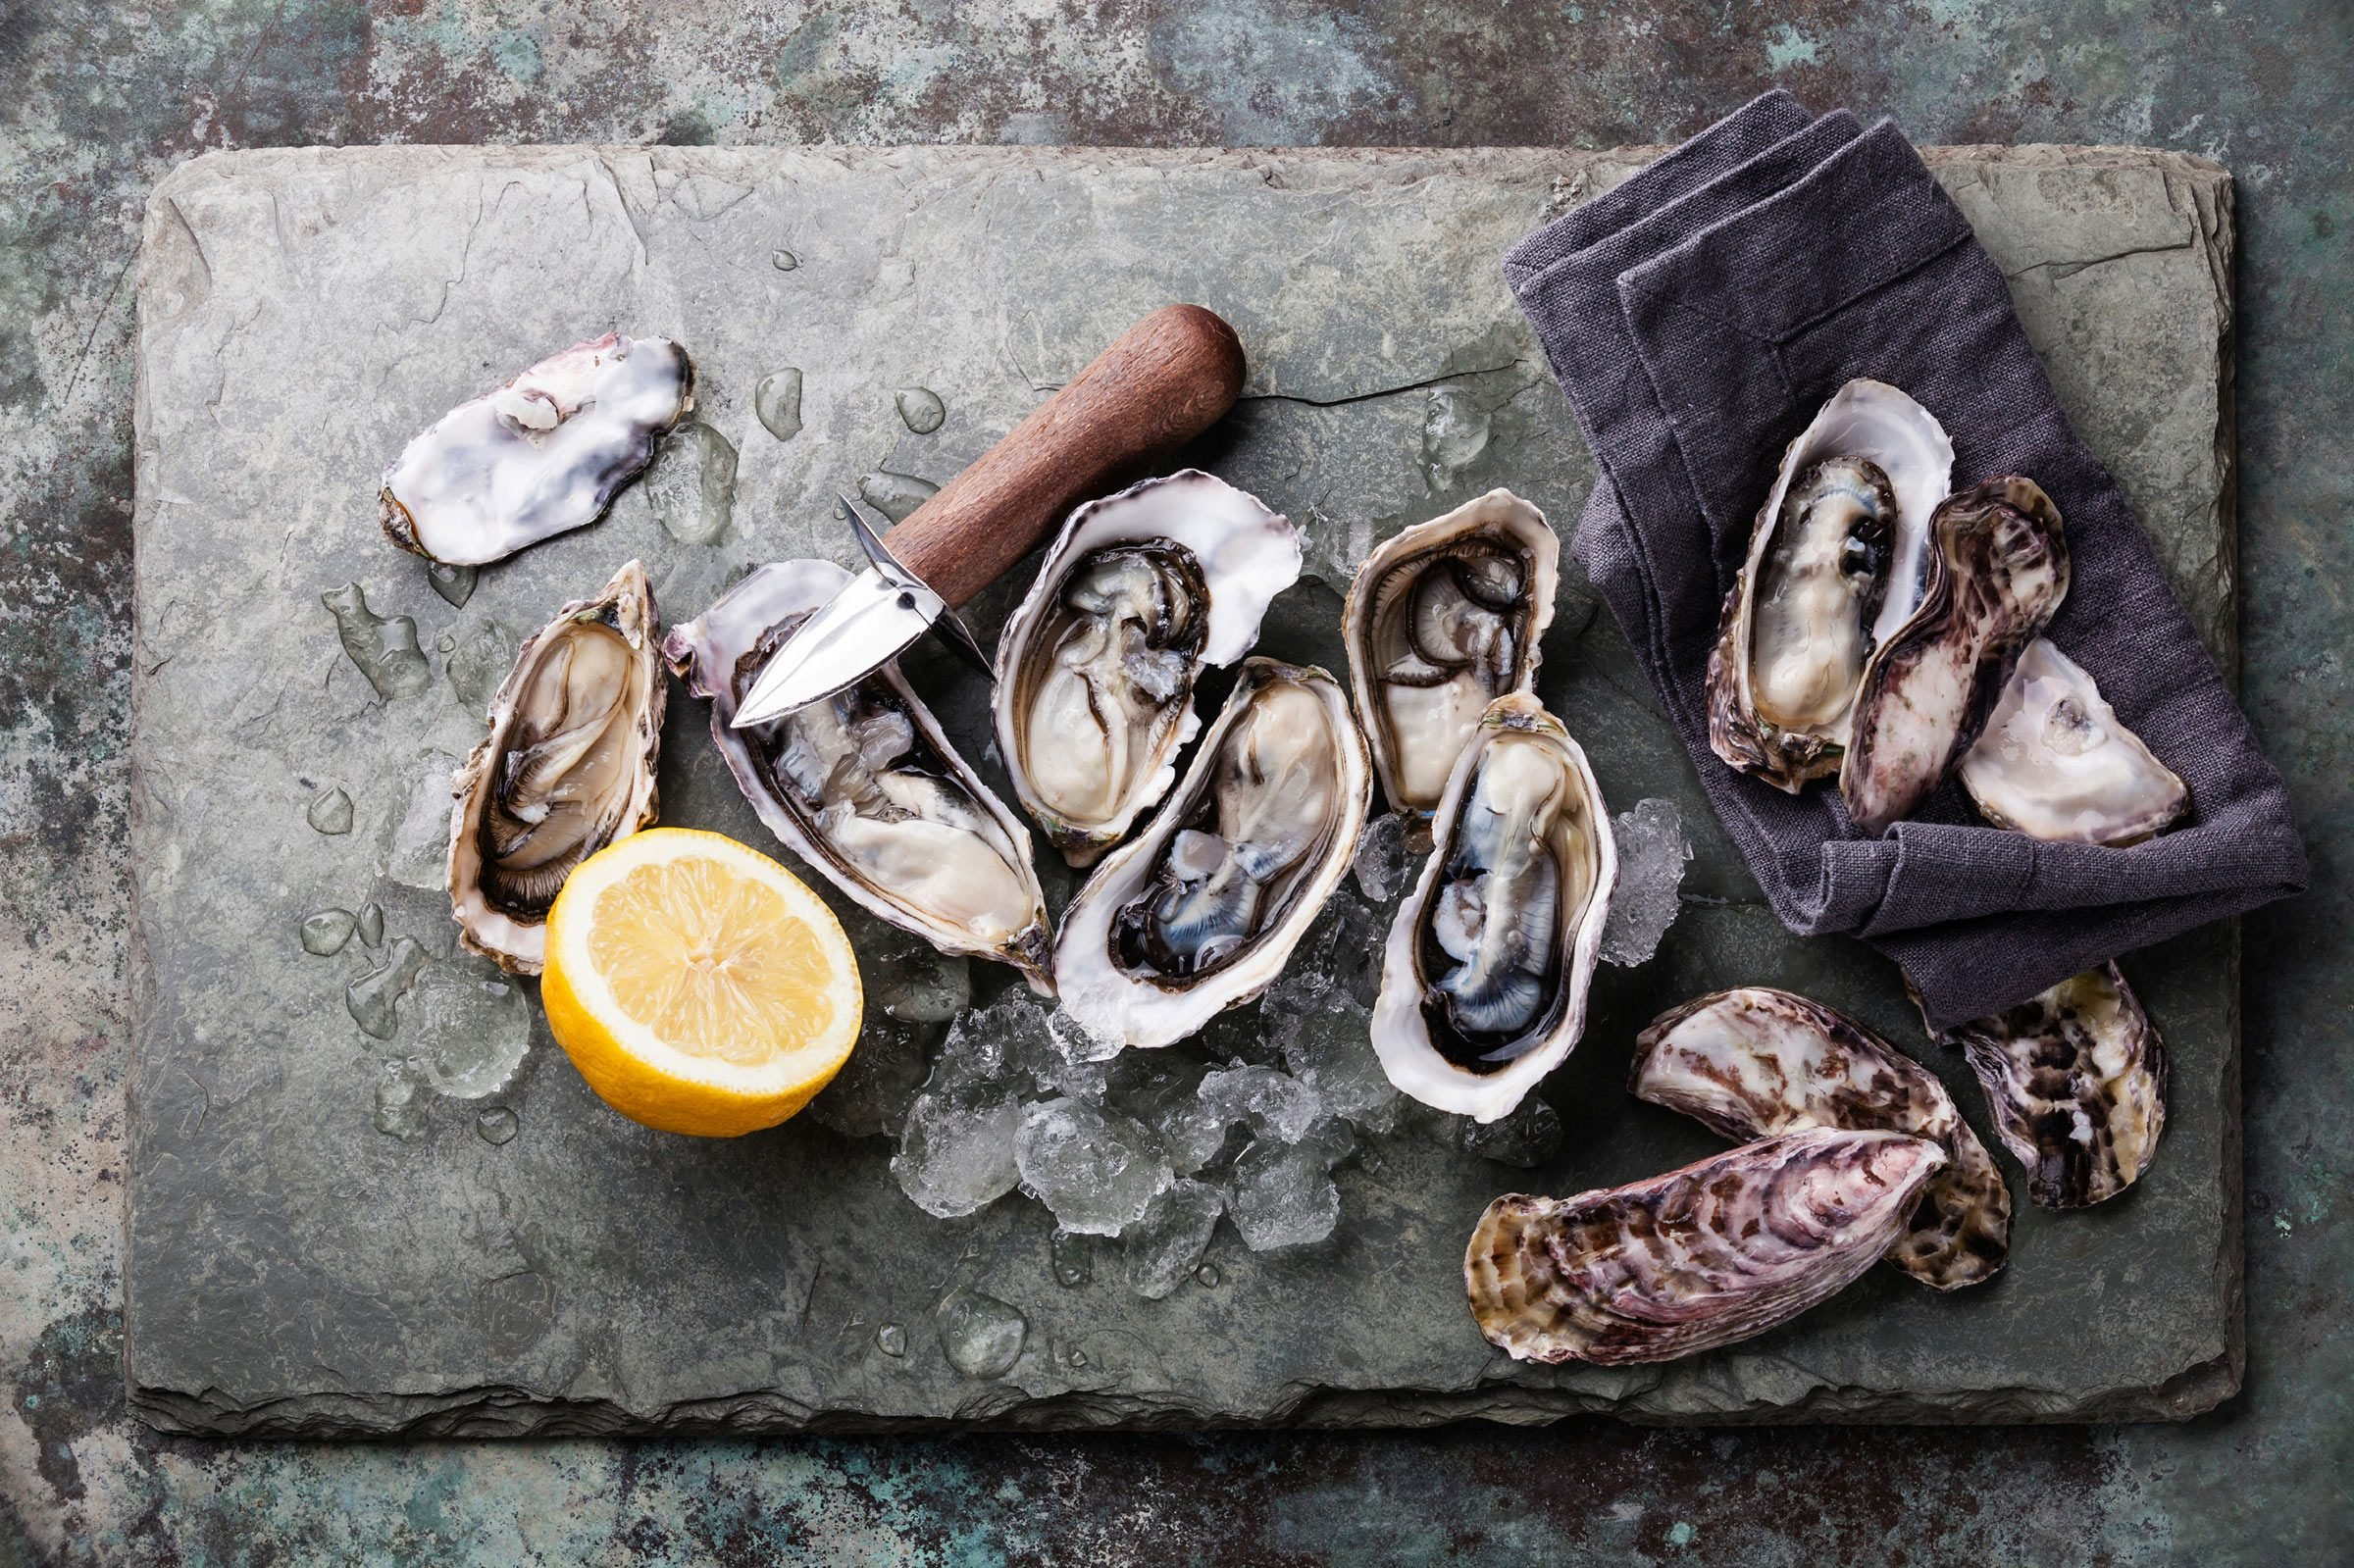 Oyster From Kalamazoo